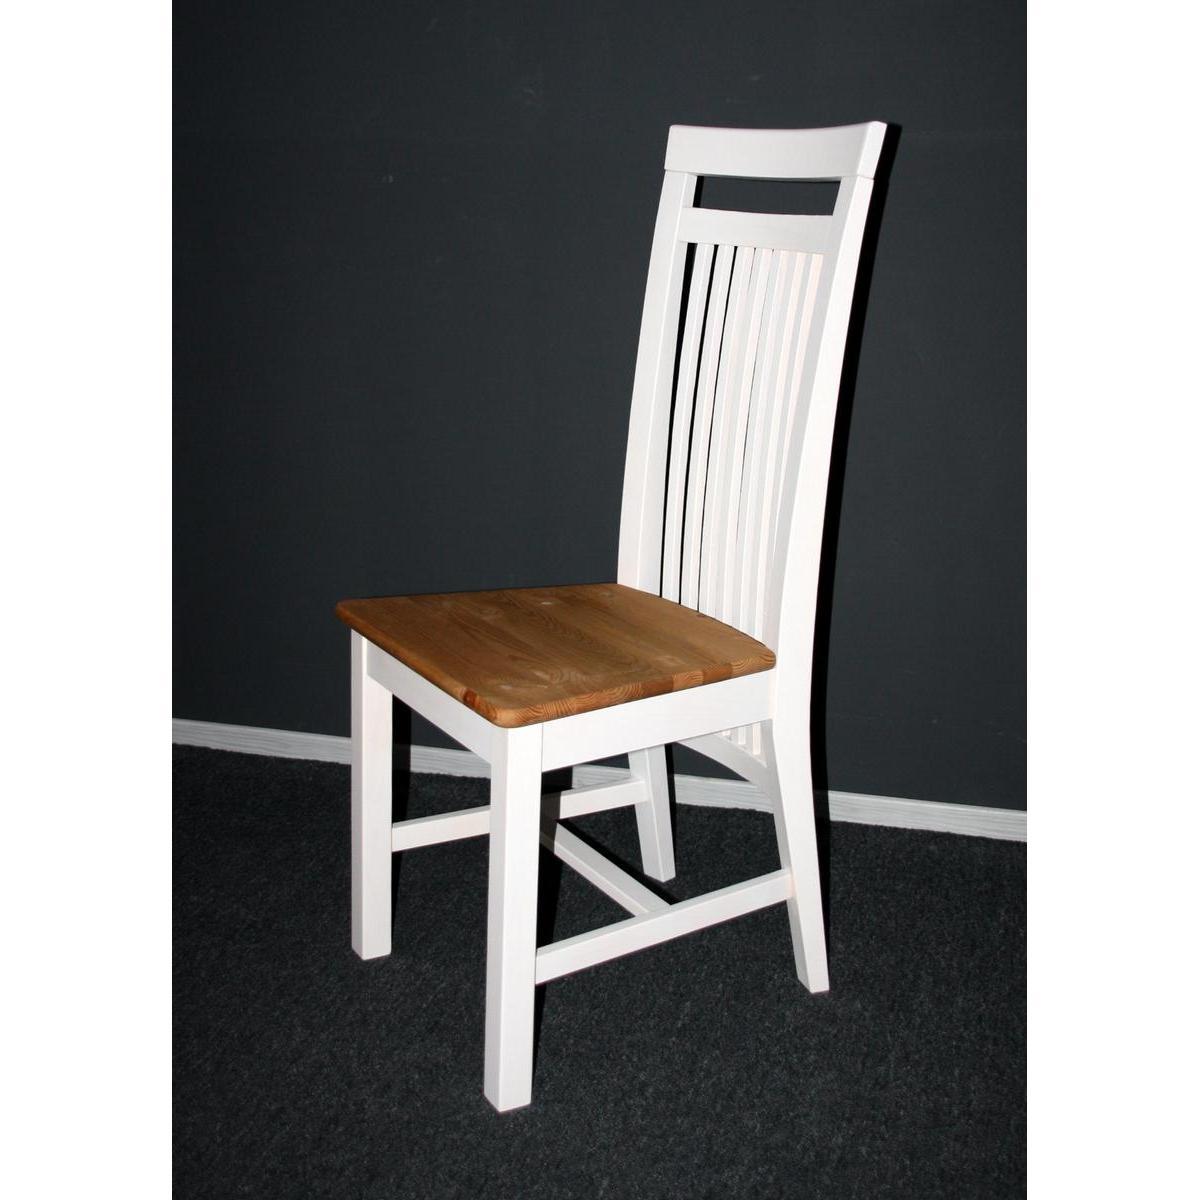 massivholz stuhl boston kiefer massiv 2 farbig wei lackiert gebeizt ge lt. Black Bedroom Furniture Sets. Home Design Ideas